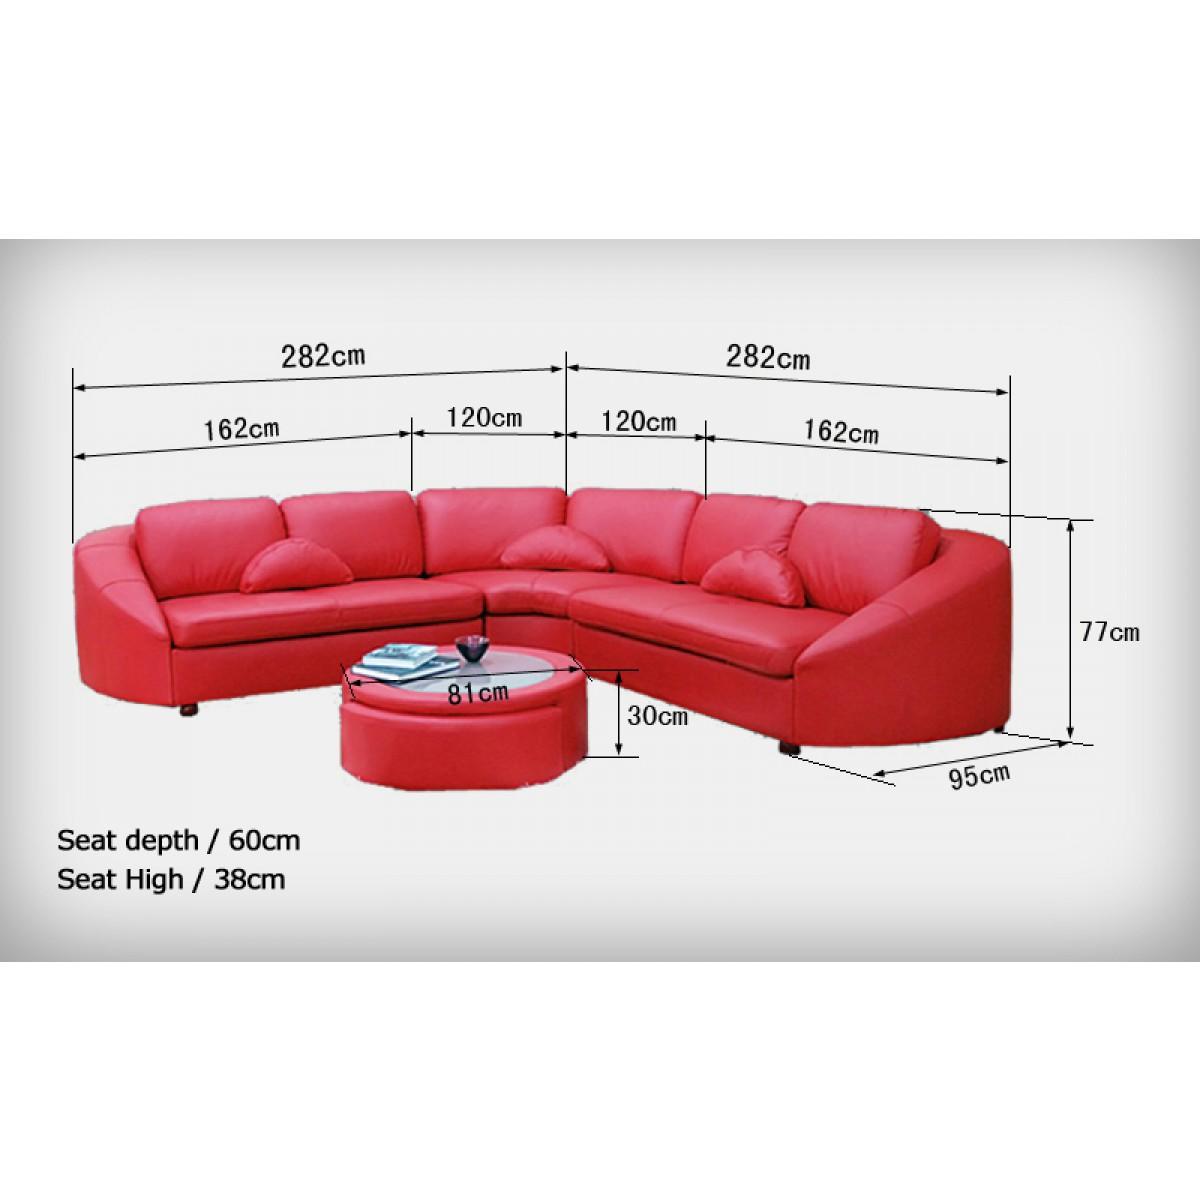 Canap d 39 angle en cuir 5 7 places aquilos - Dimension d un canape ...